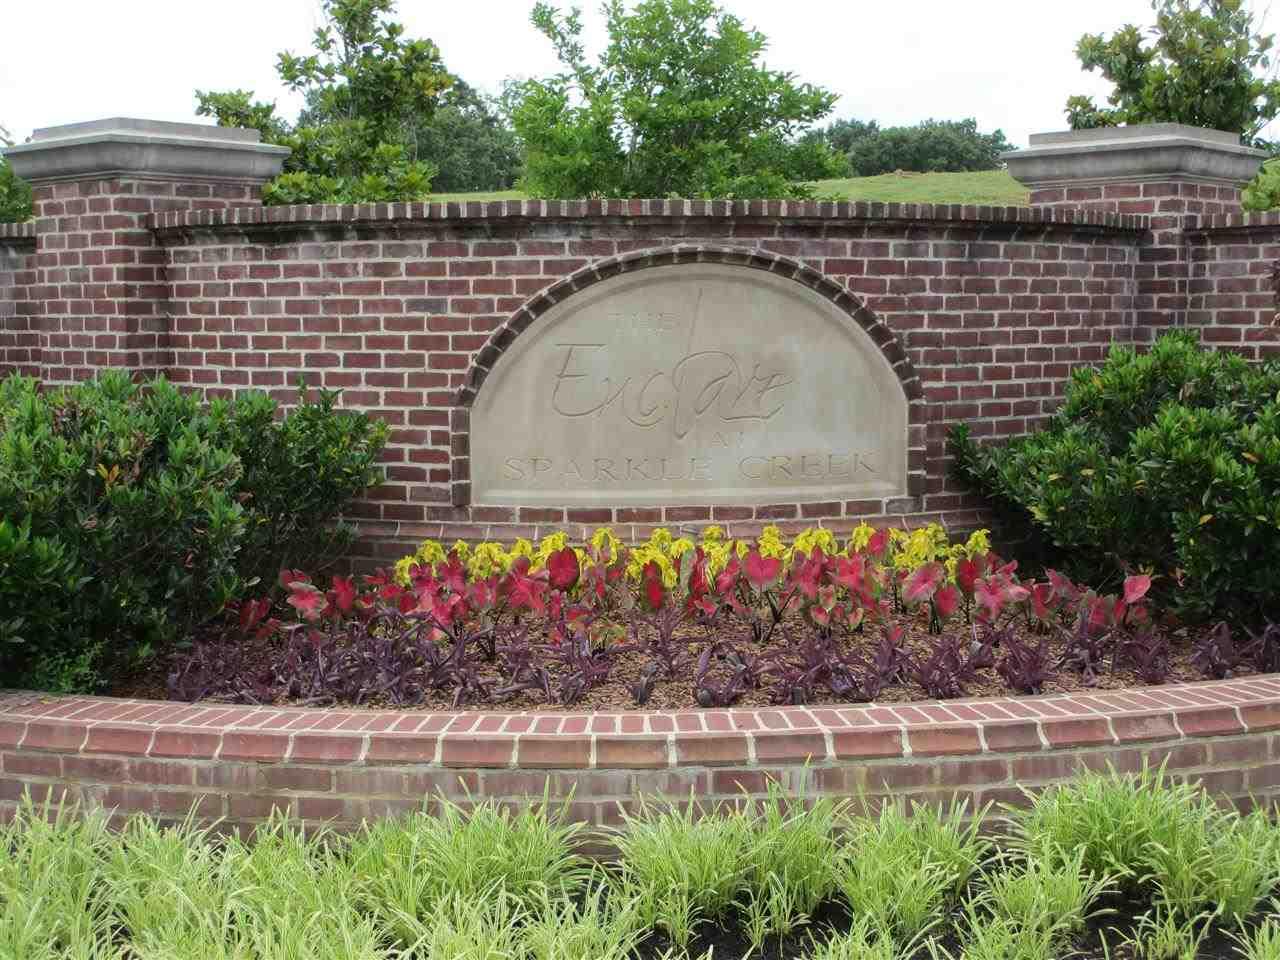 306 Lexington Manor Eads, TN 38028 - MLS #: 10027007